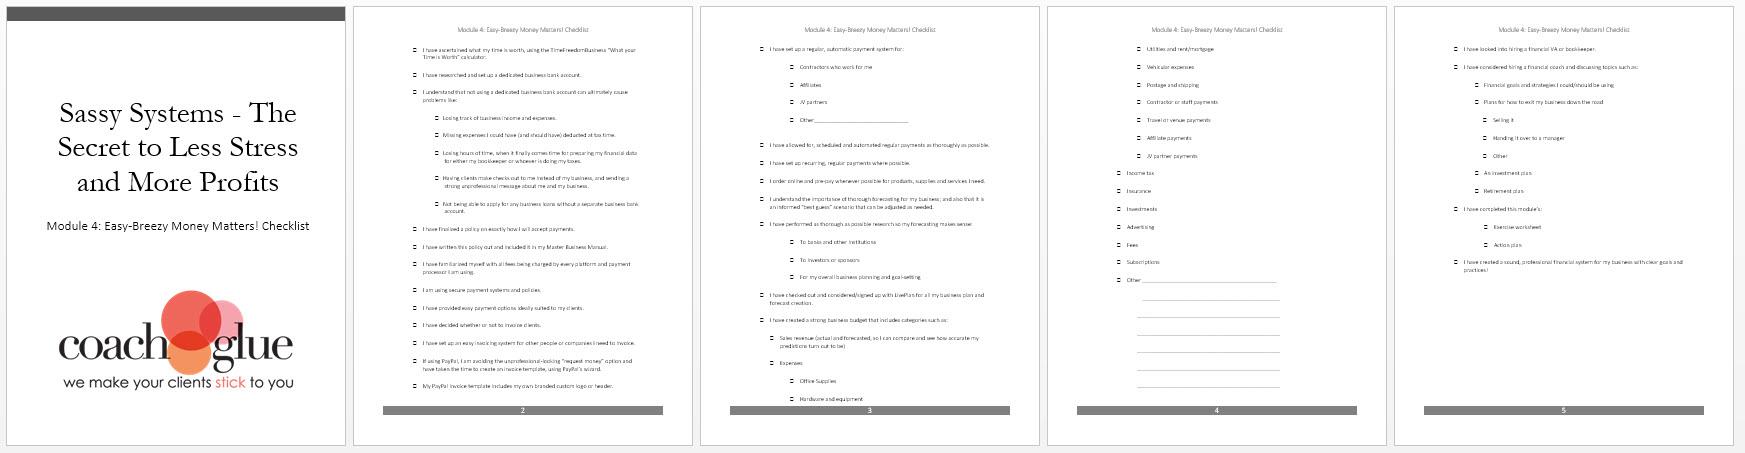 Module 4 Easy Breezy Money Matters Checklist Screenshot